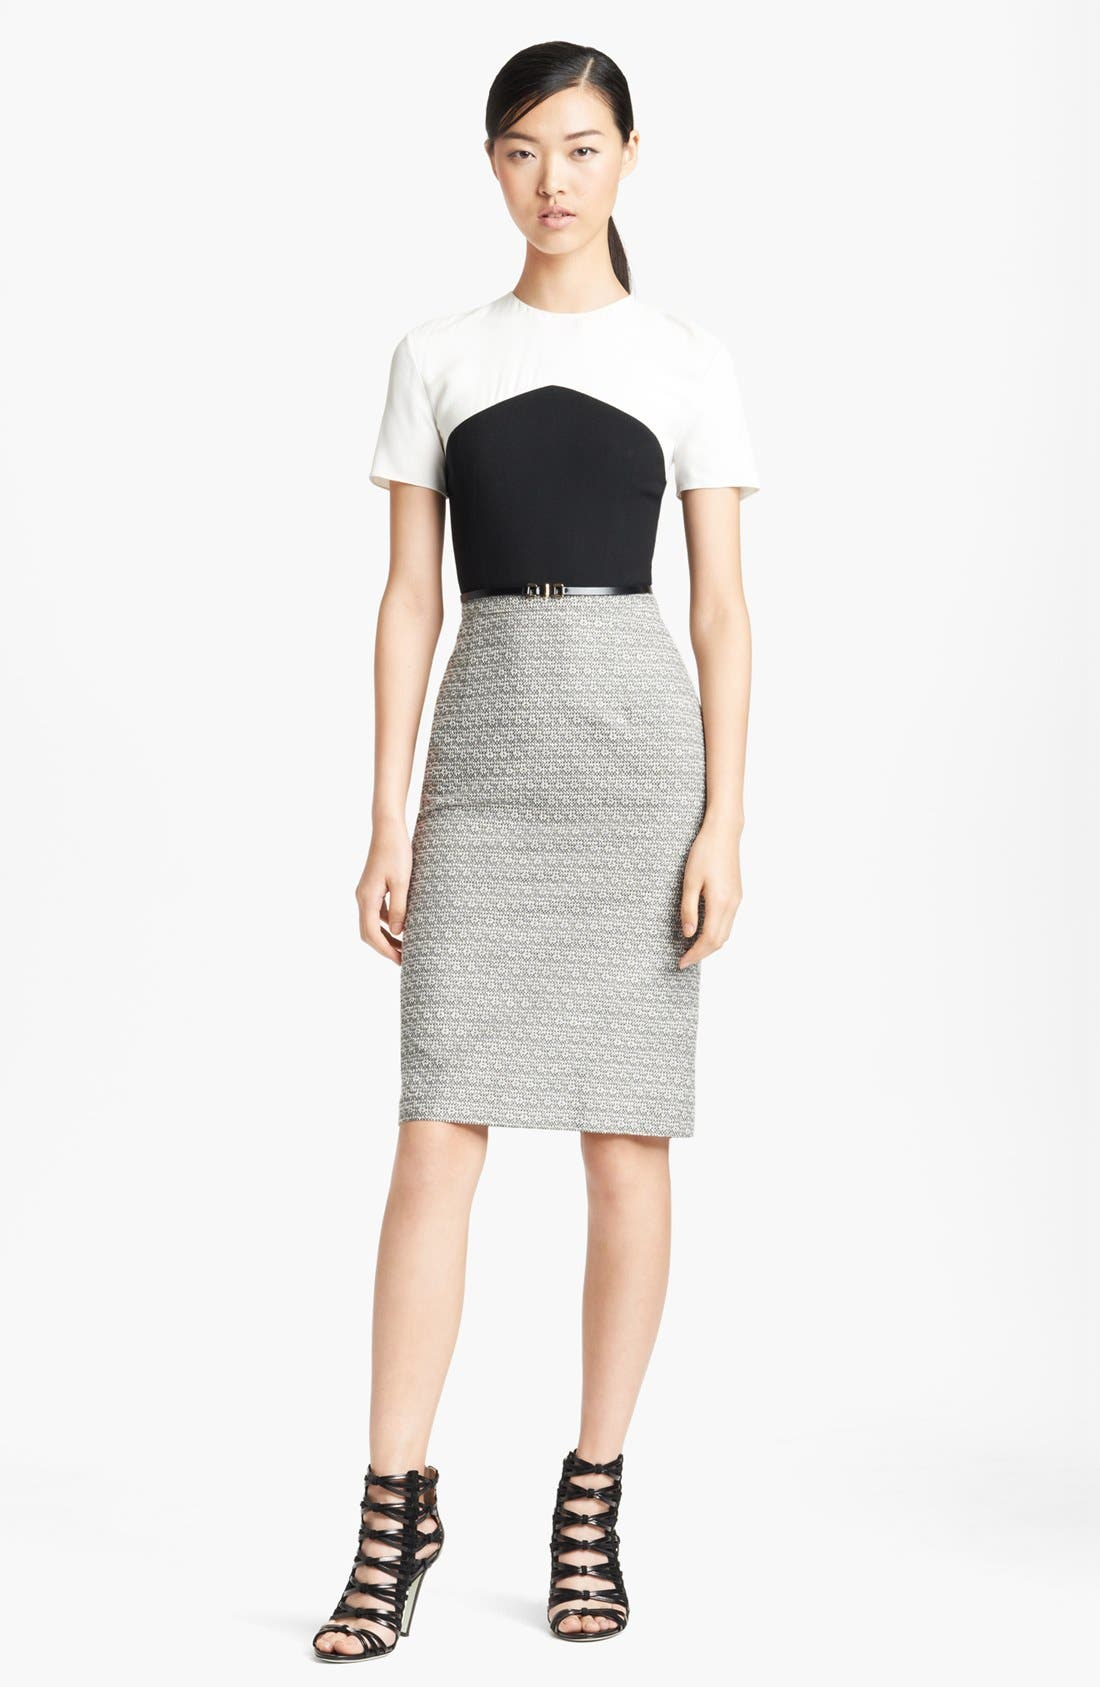 Alternate Image 1 Selected - Jason Wu Colorblock Crepe & Tweed Dress